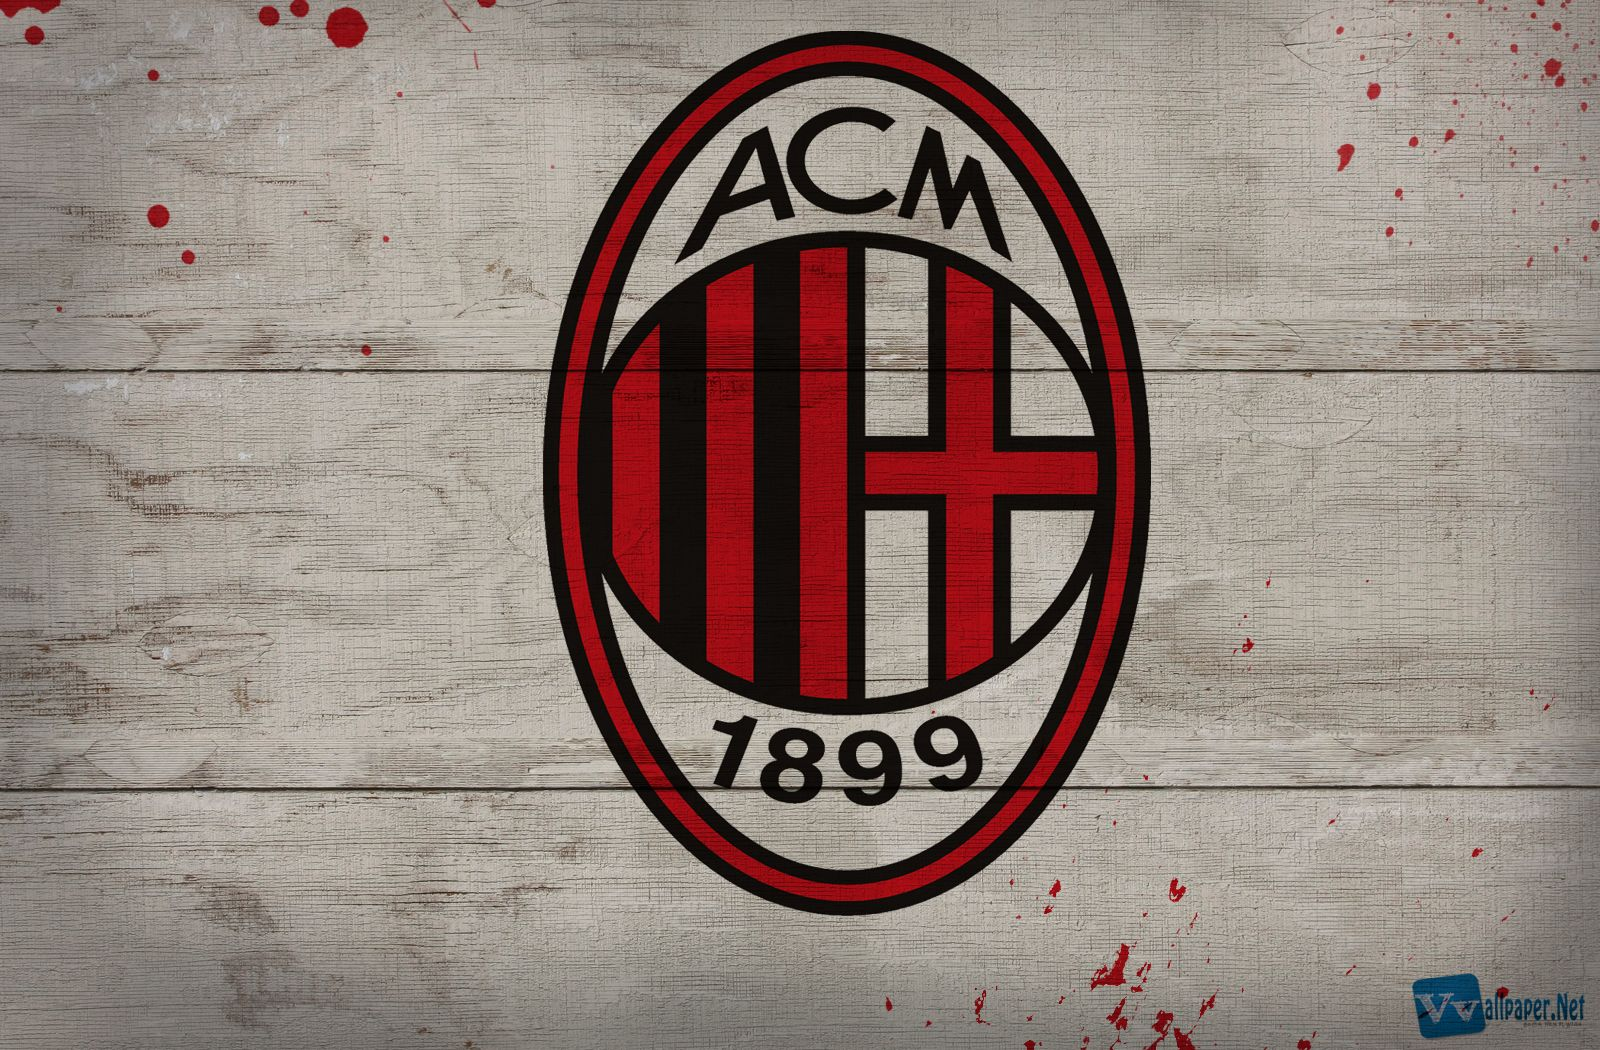 Design car club logo - Download Ac Milan Football Club Logo Design Vvallpapernet